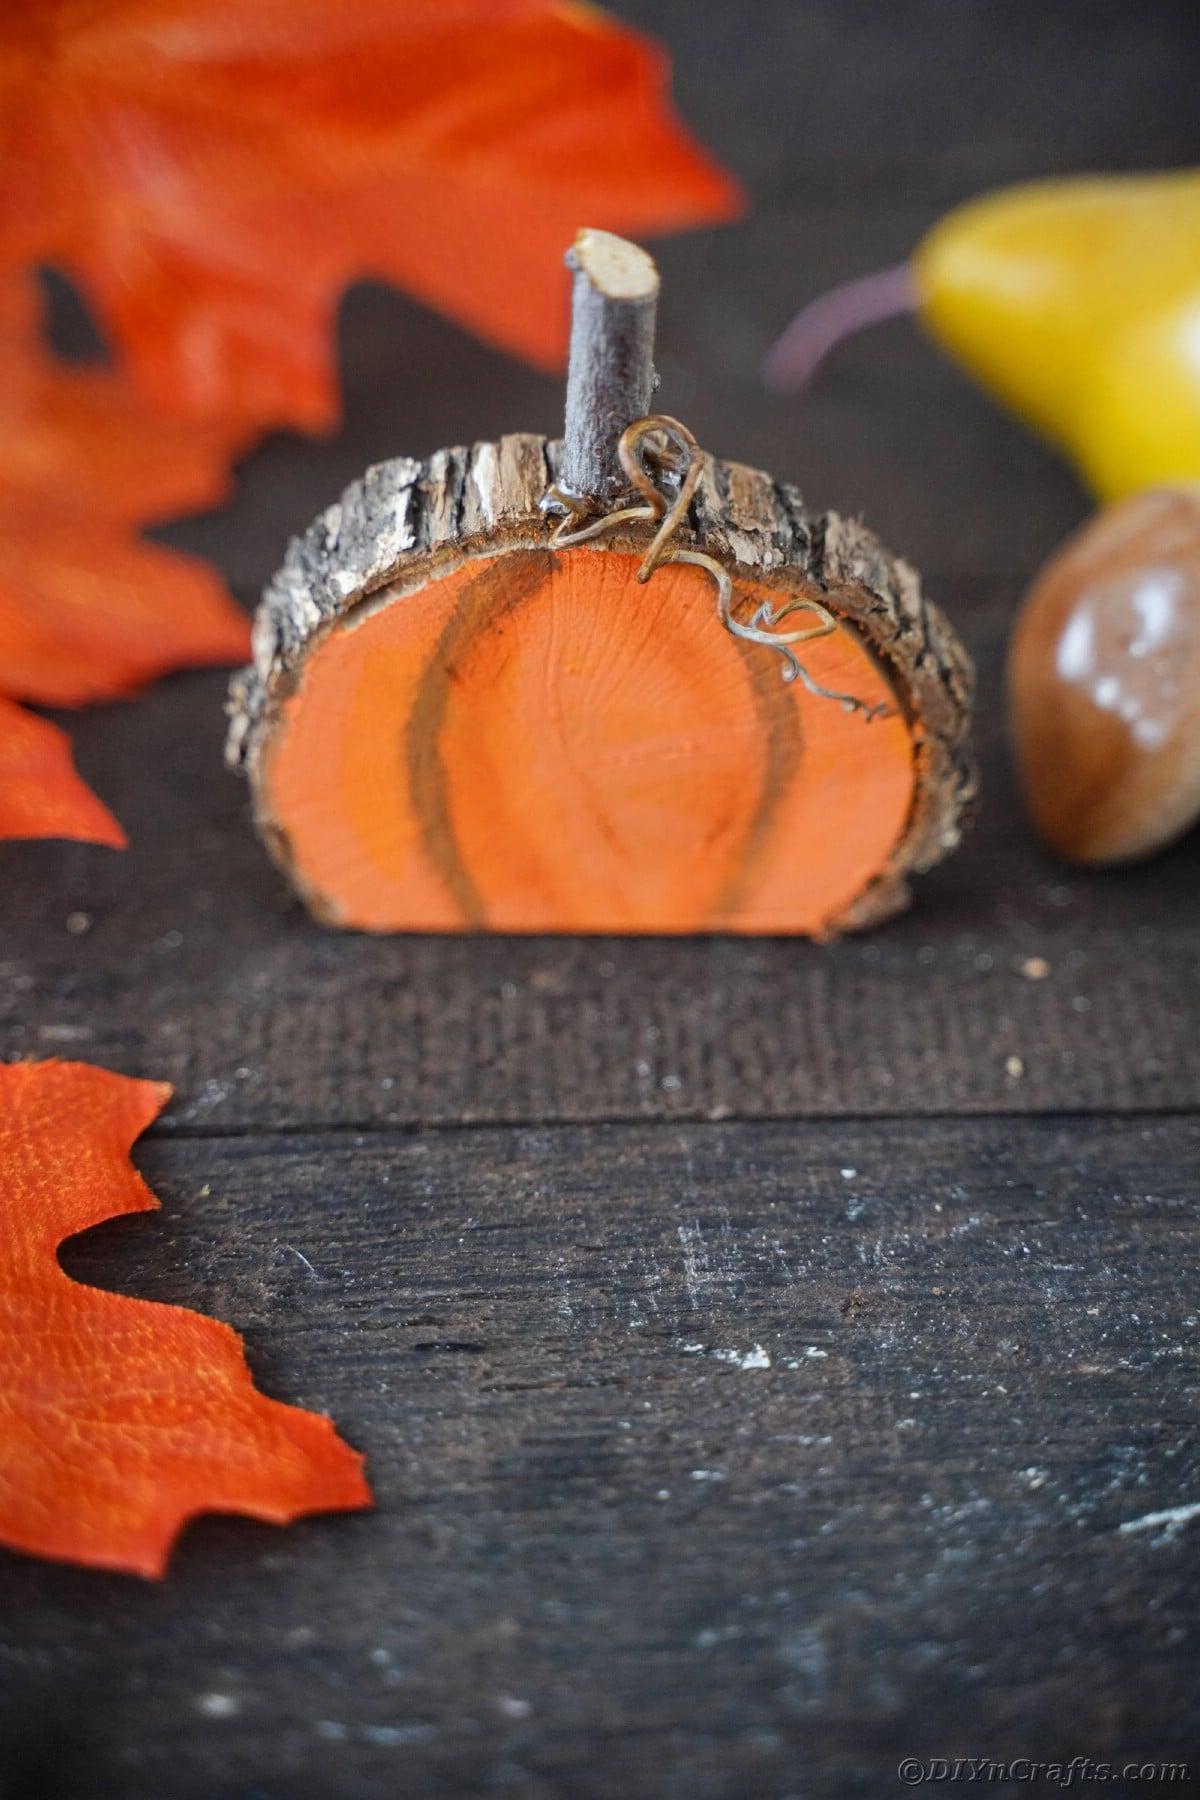 Dark wood table with painted wood slice pumpkin